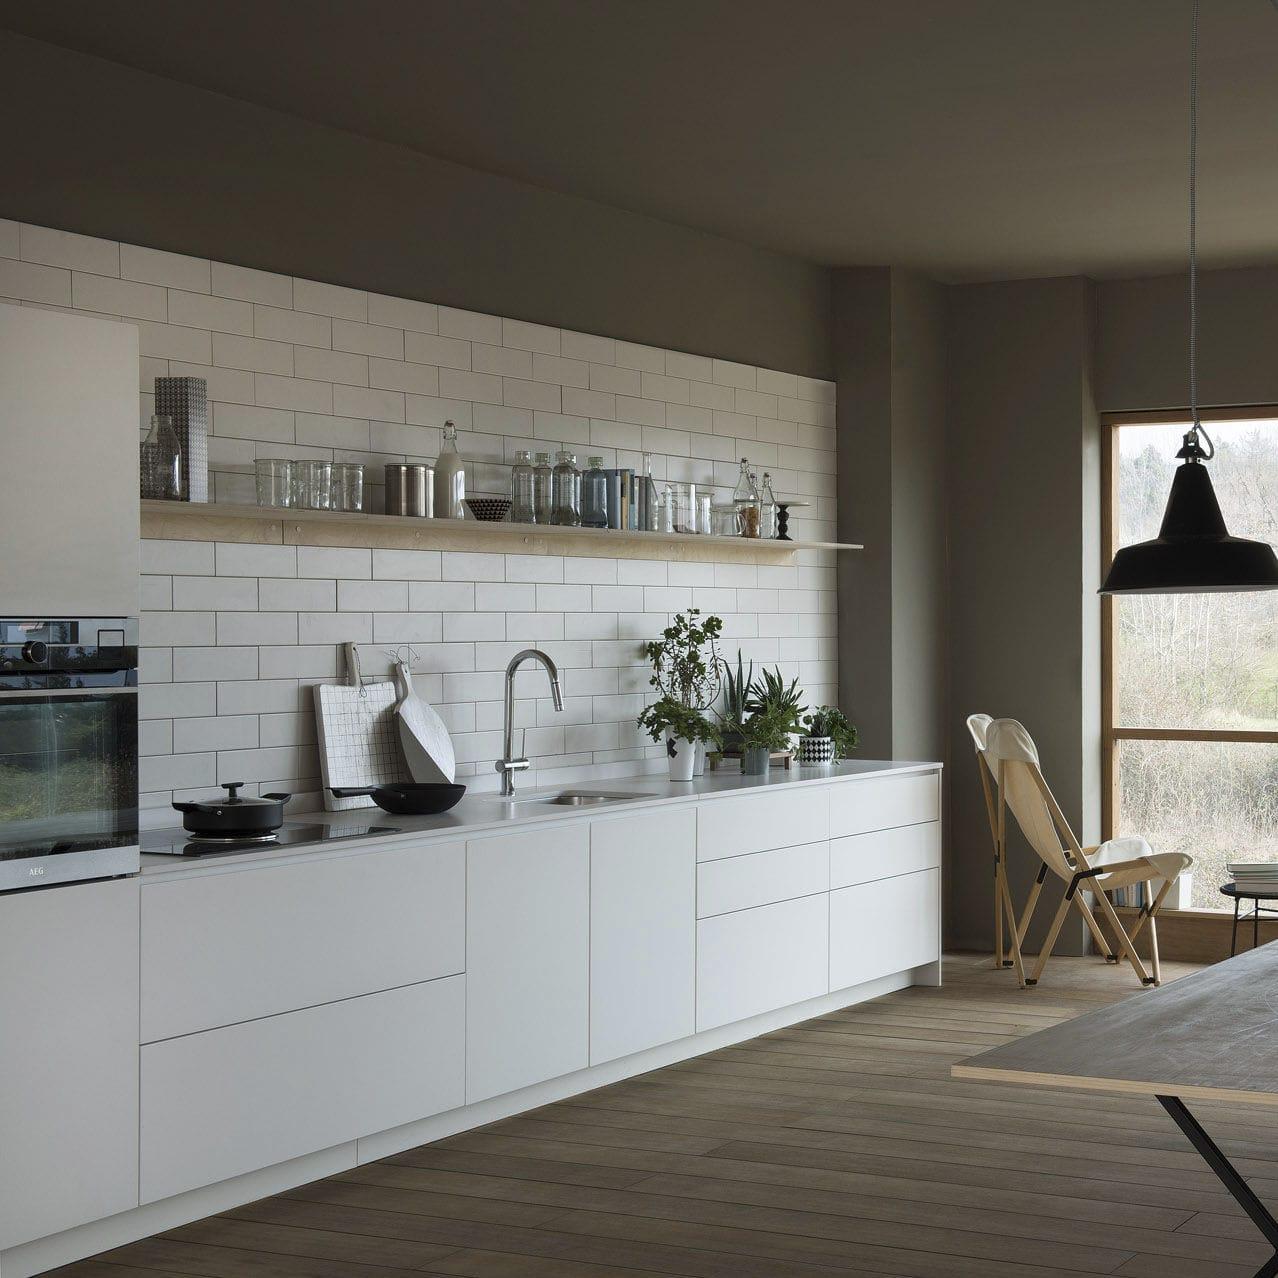 Maniglie Cucina Moderna | Maniglia Con Strass Swarovski Per Mobili ...